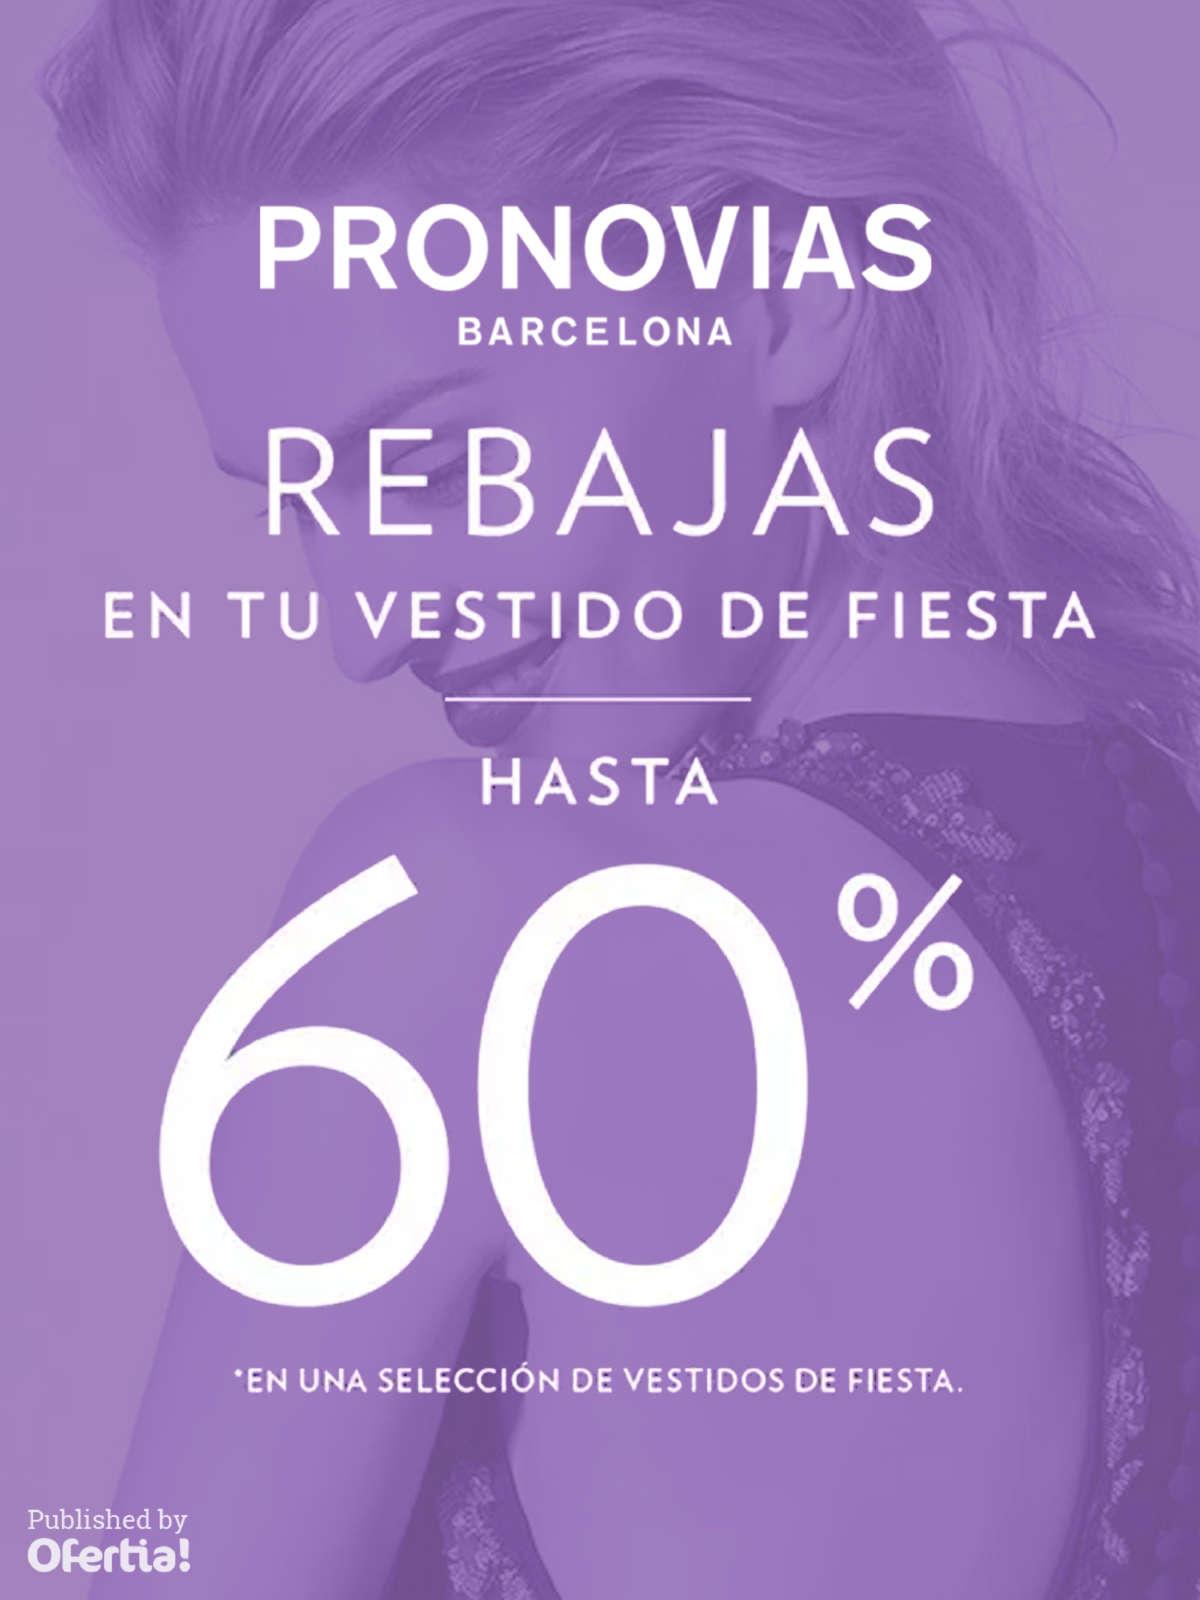 Pronovias Zaragoza - Ofertas, catálogo y folletos - Ofertia